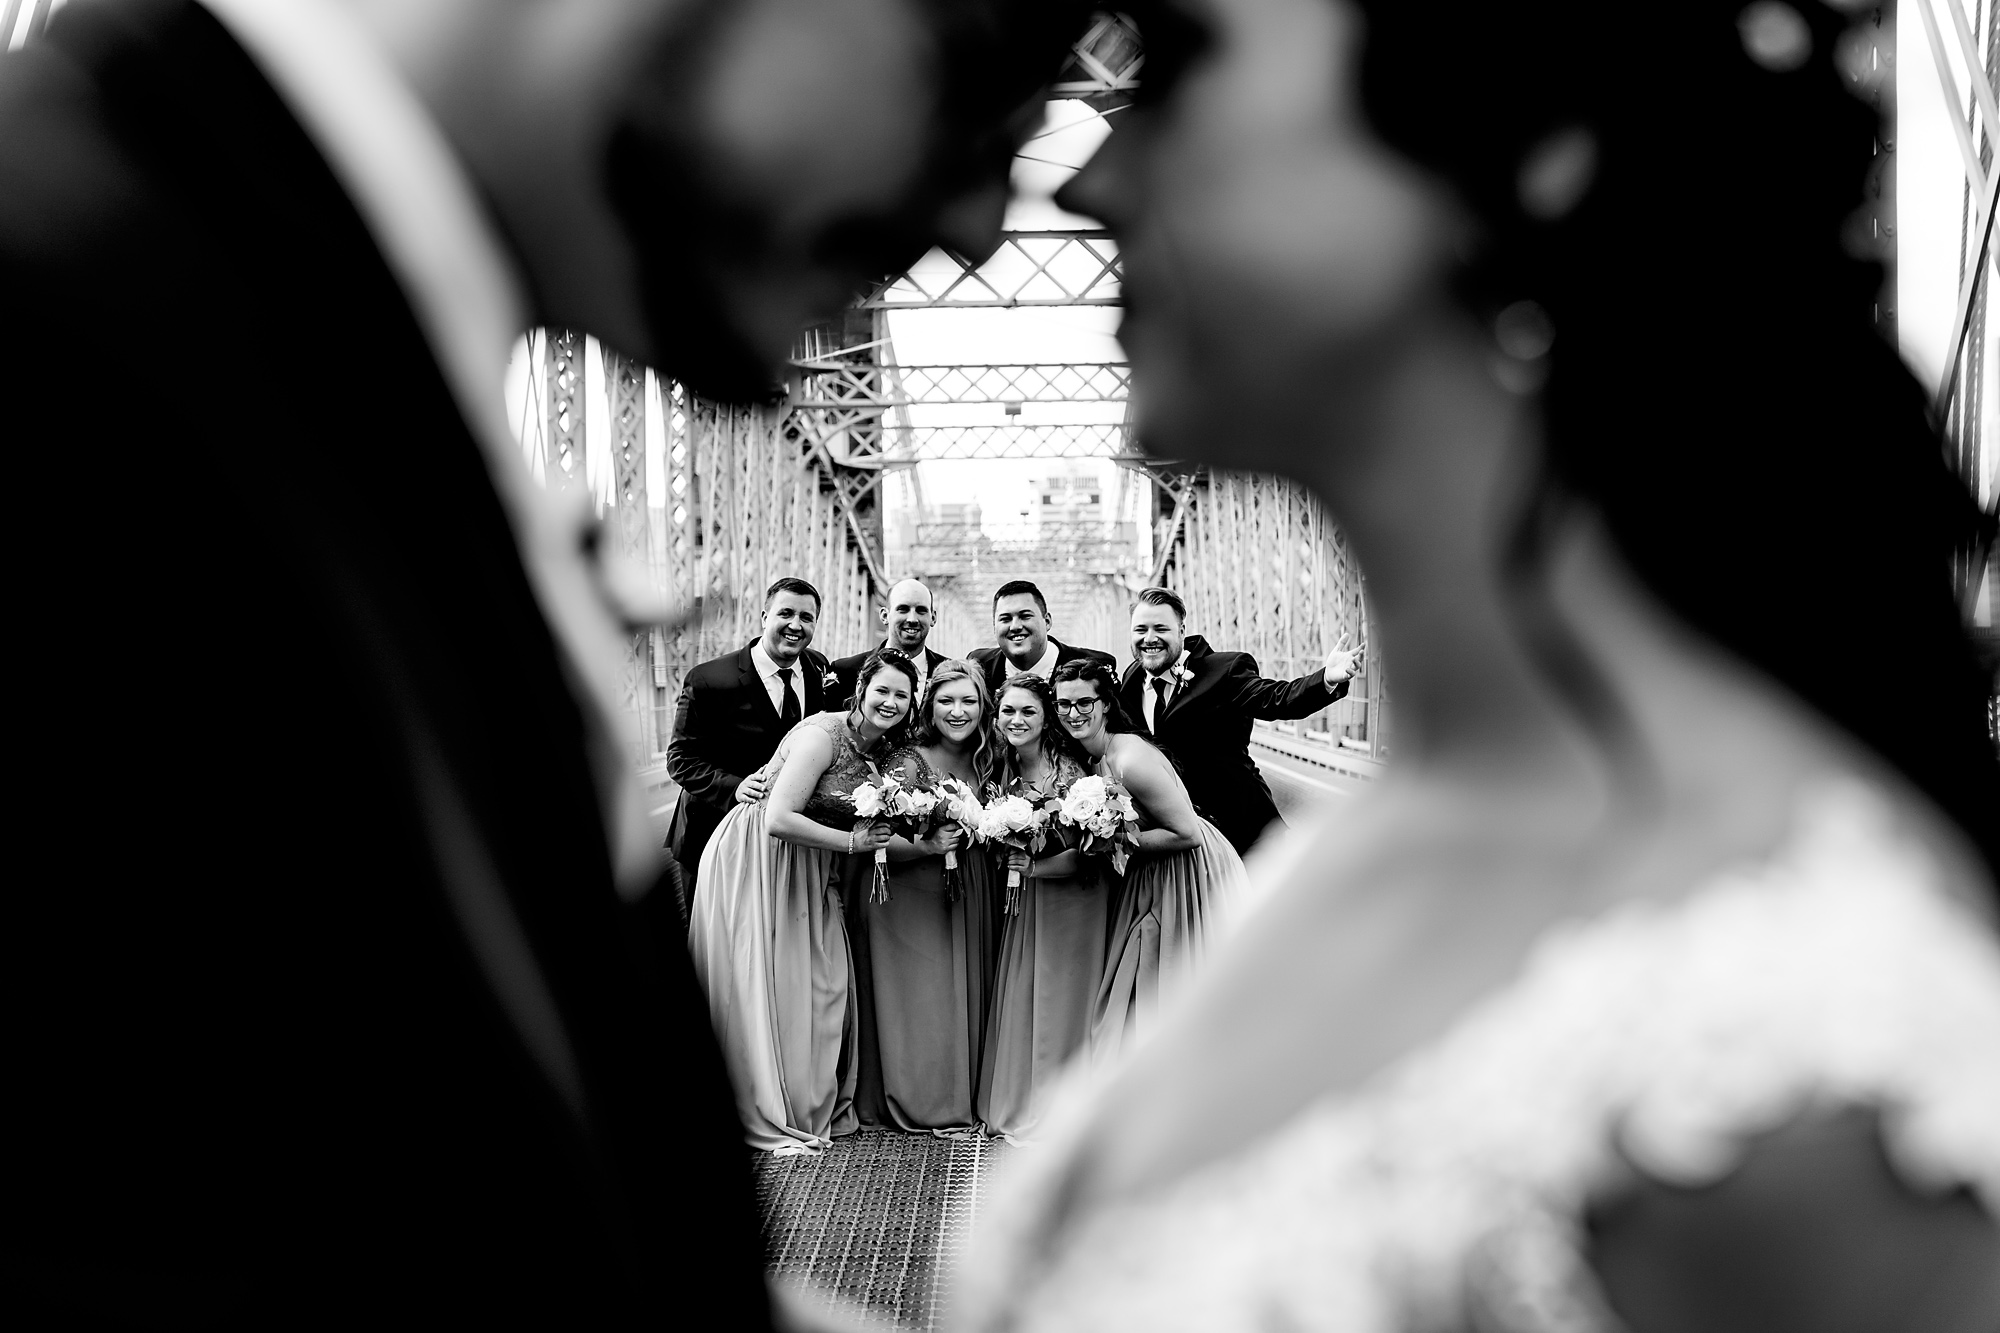 Embassy-Suites-Rivercenter-Wedding-Photography-15.jpg